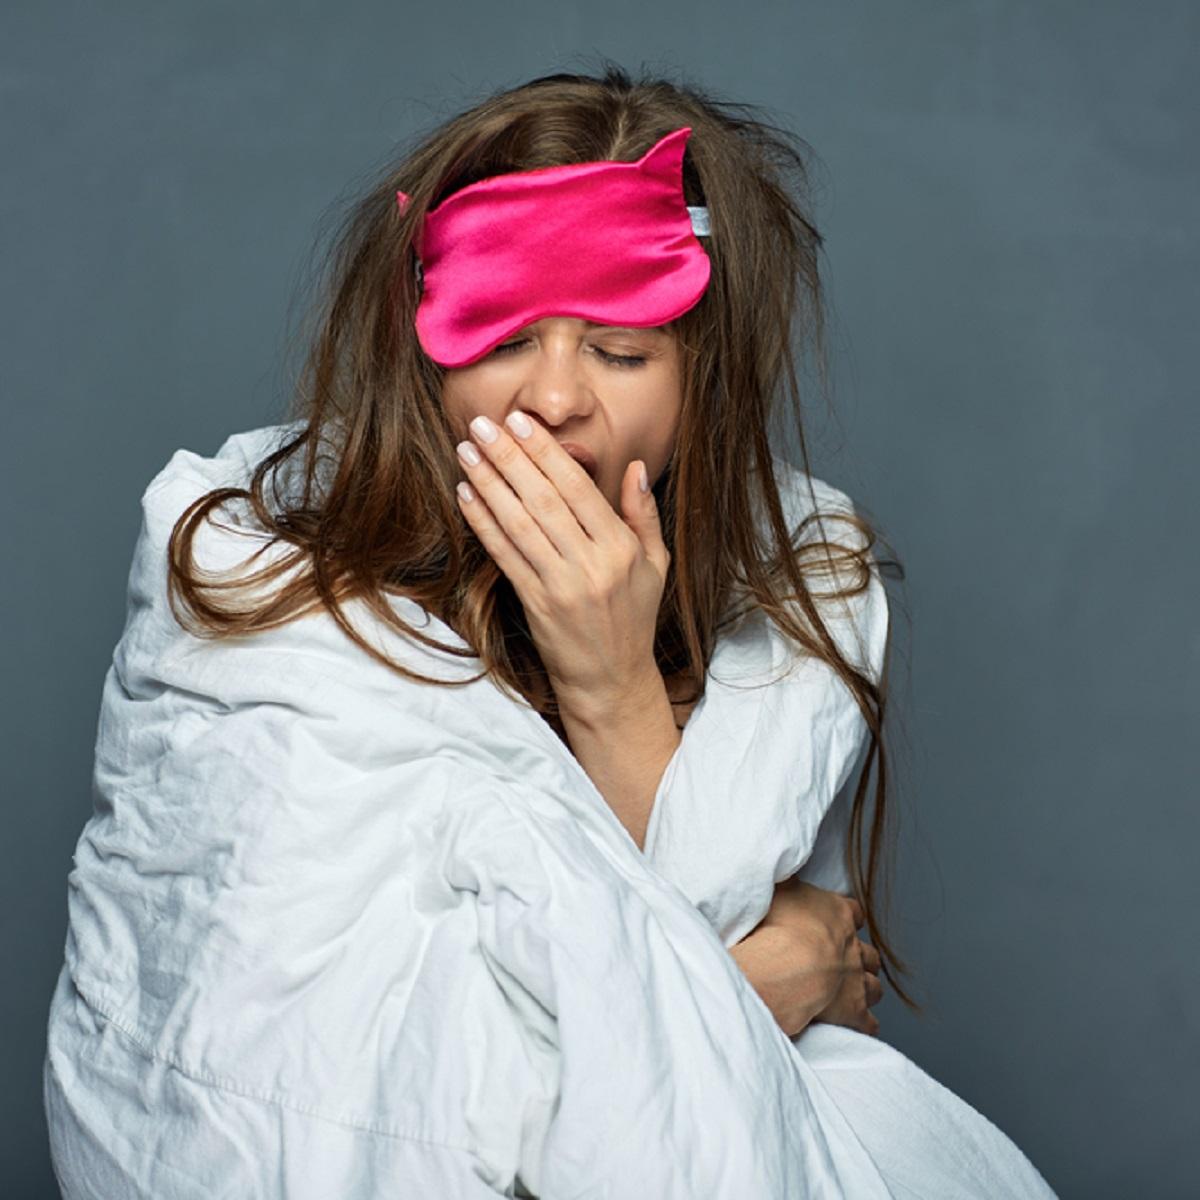 MAJOR SLEEP DISORDERS EXPLAINED – The Full List of Most Common Sleep Disorders